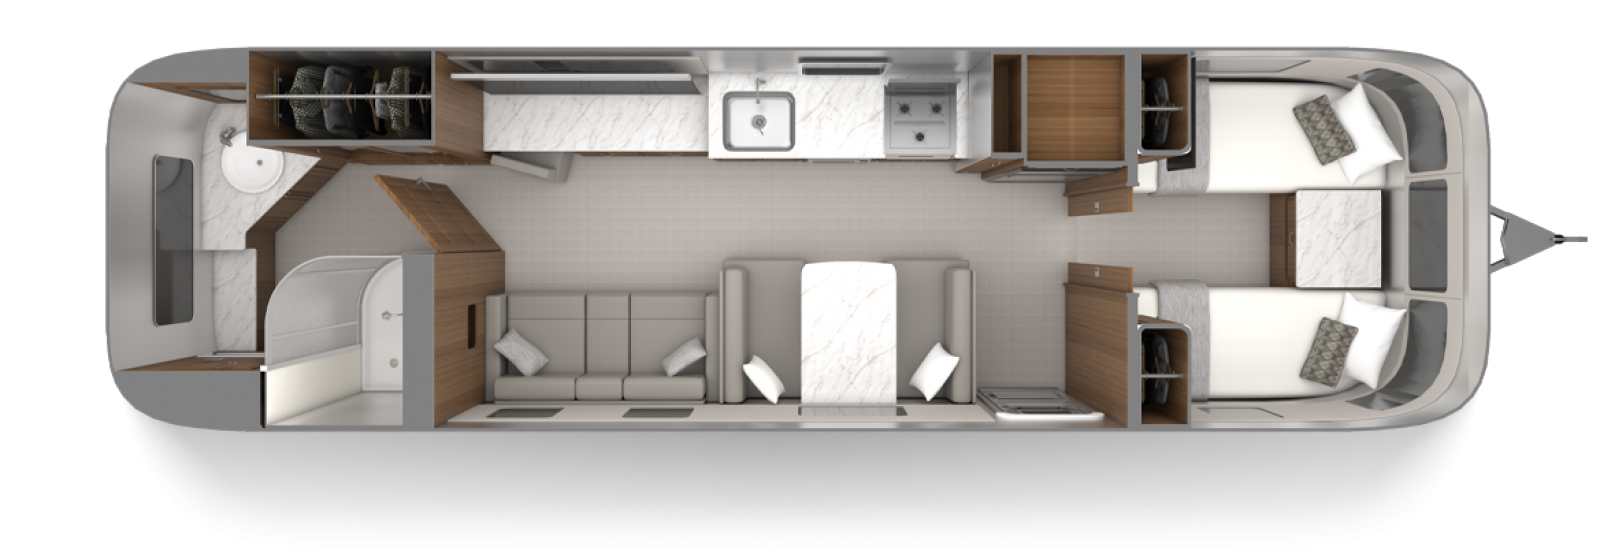 Classic-33FB-Classic-Floor-Plan-Estate-Brown-Earl-Grey-Twin